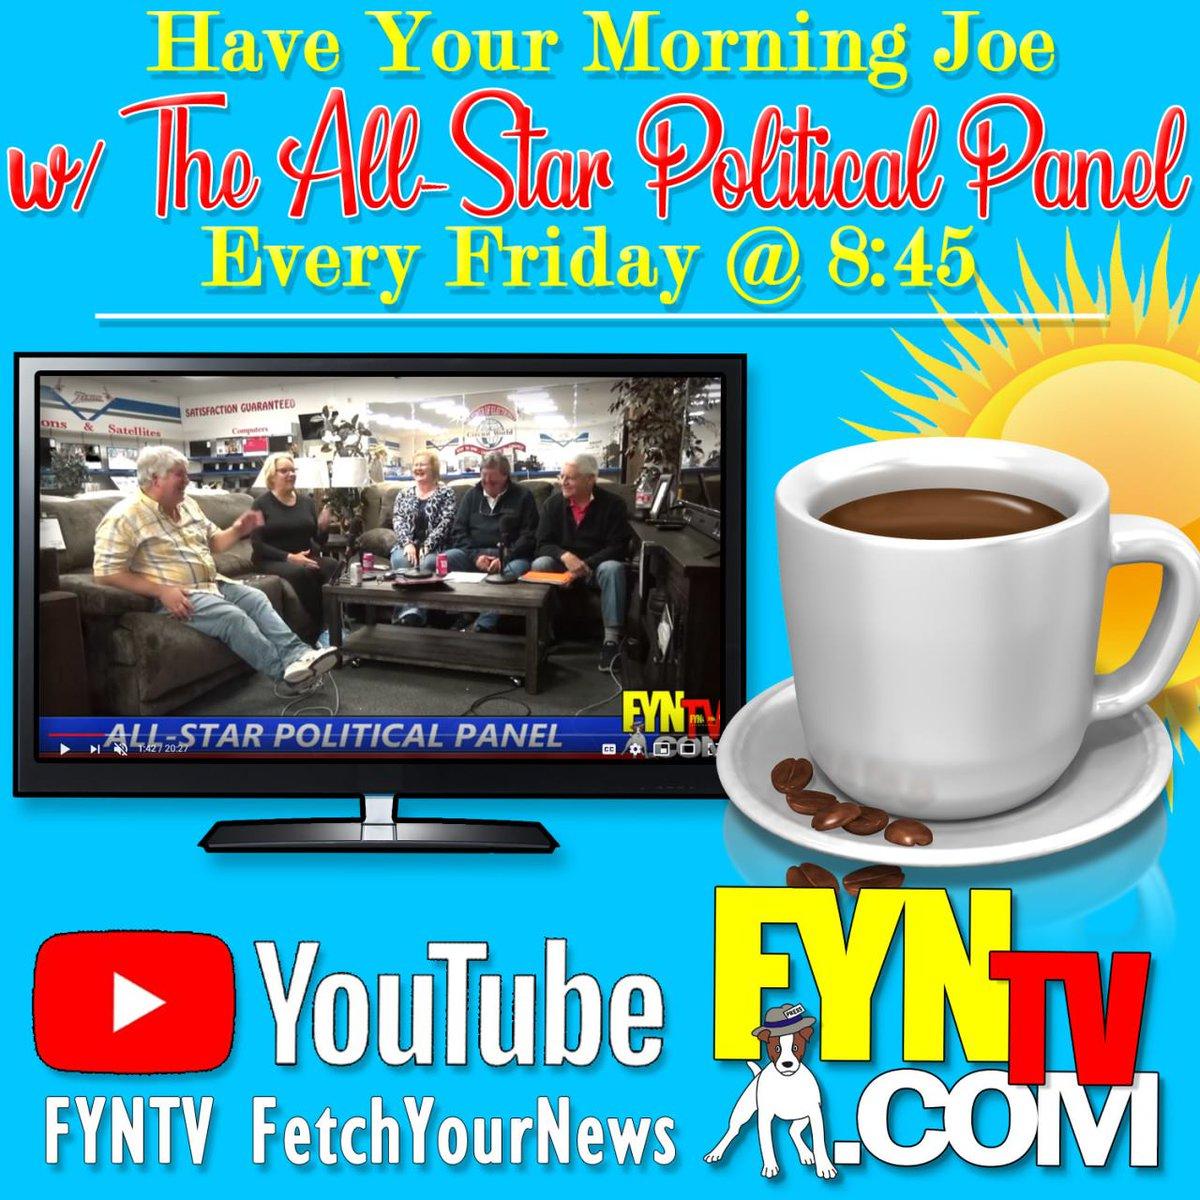 Wake up with the All-Star Political Panel! LIVE every Friday @ 8:45 a.m. on https://t.co/sRhQb4p4R0. #GaPol #BKPpolitics #Politics #Part #Trumps #Government #News #LocalNews #BlueRidge #Ellijay #GaRep #GaDem #Georgia https://t.co/LGSwV2WInl